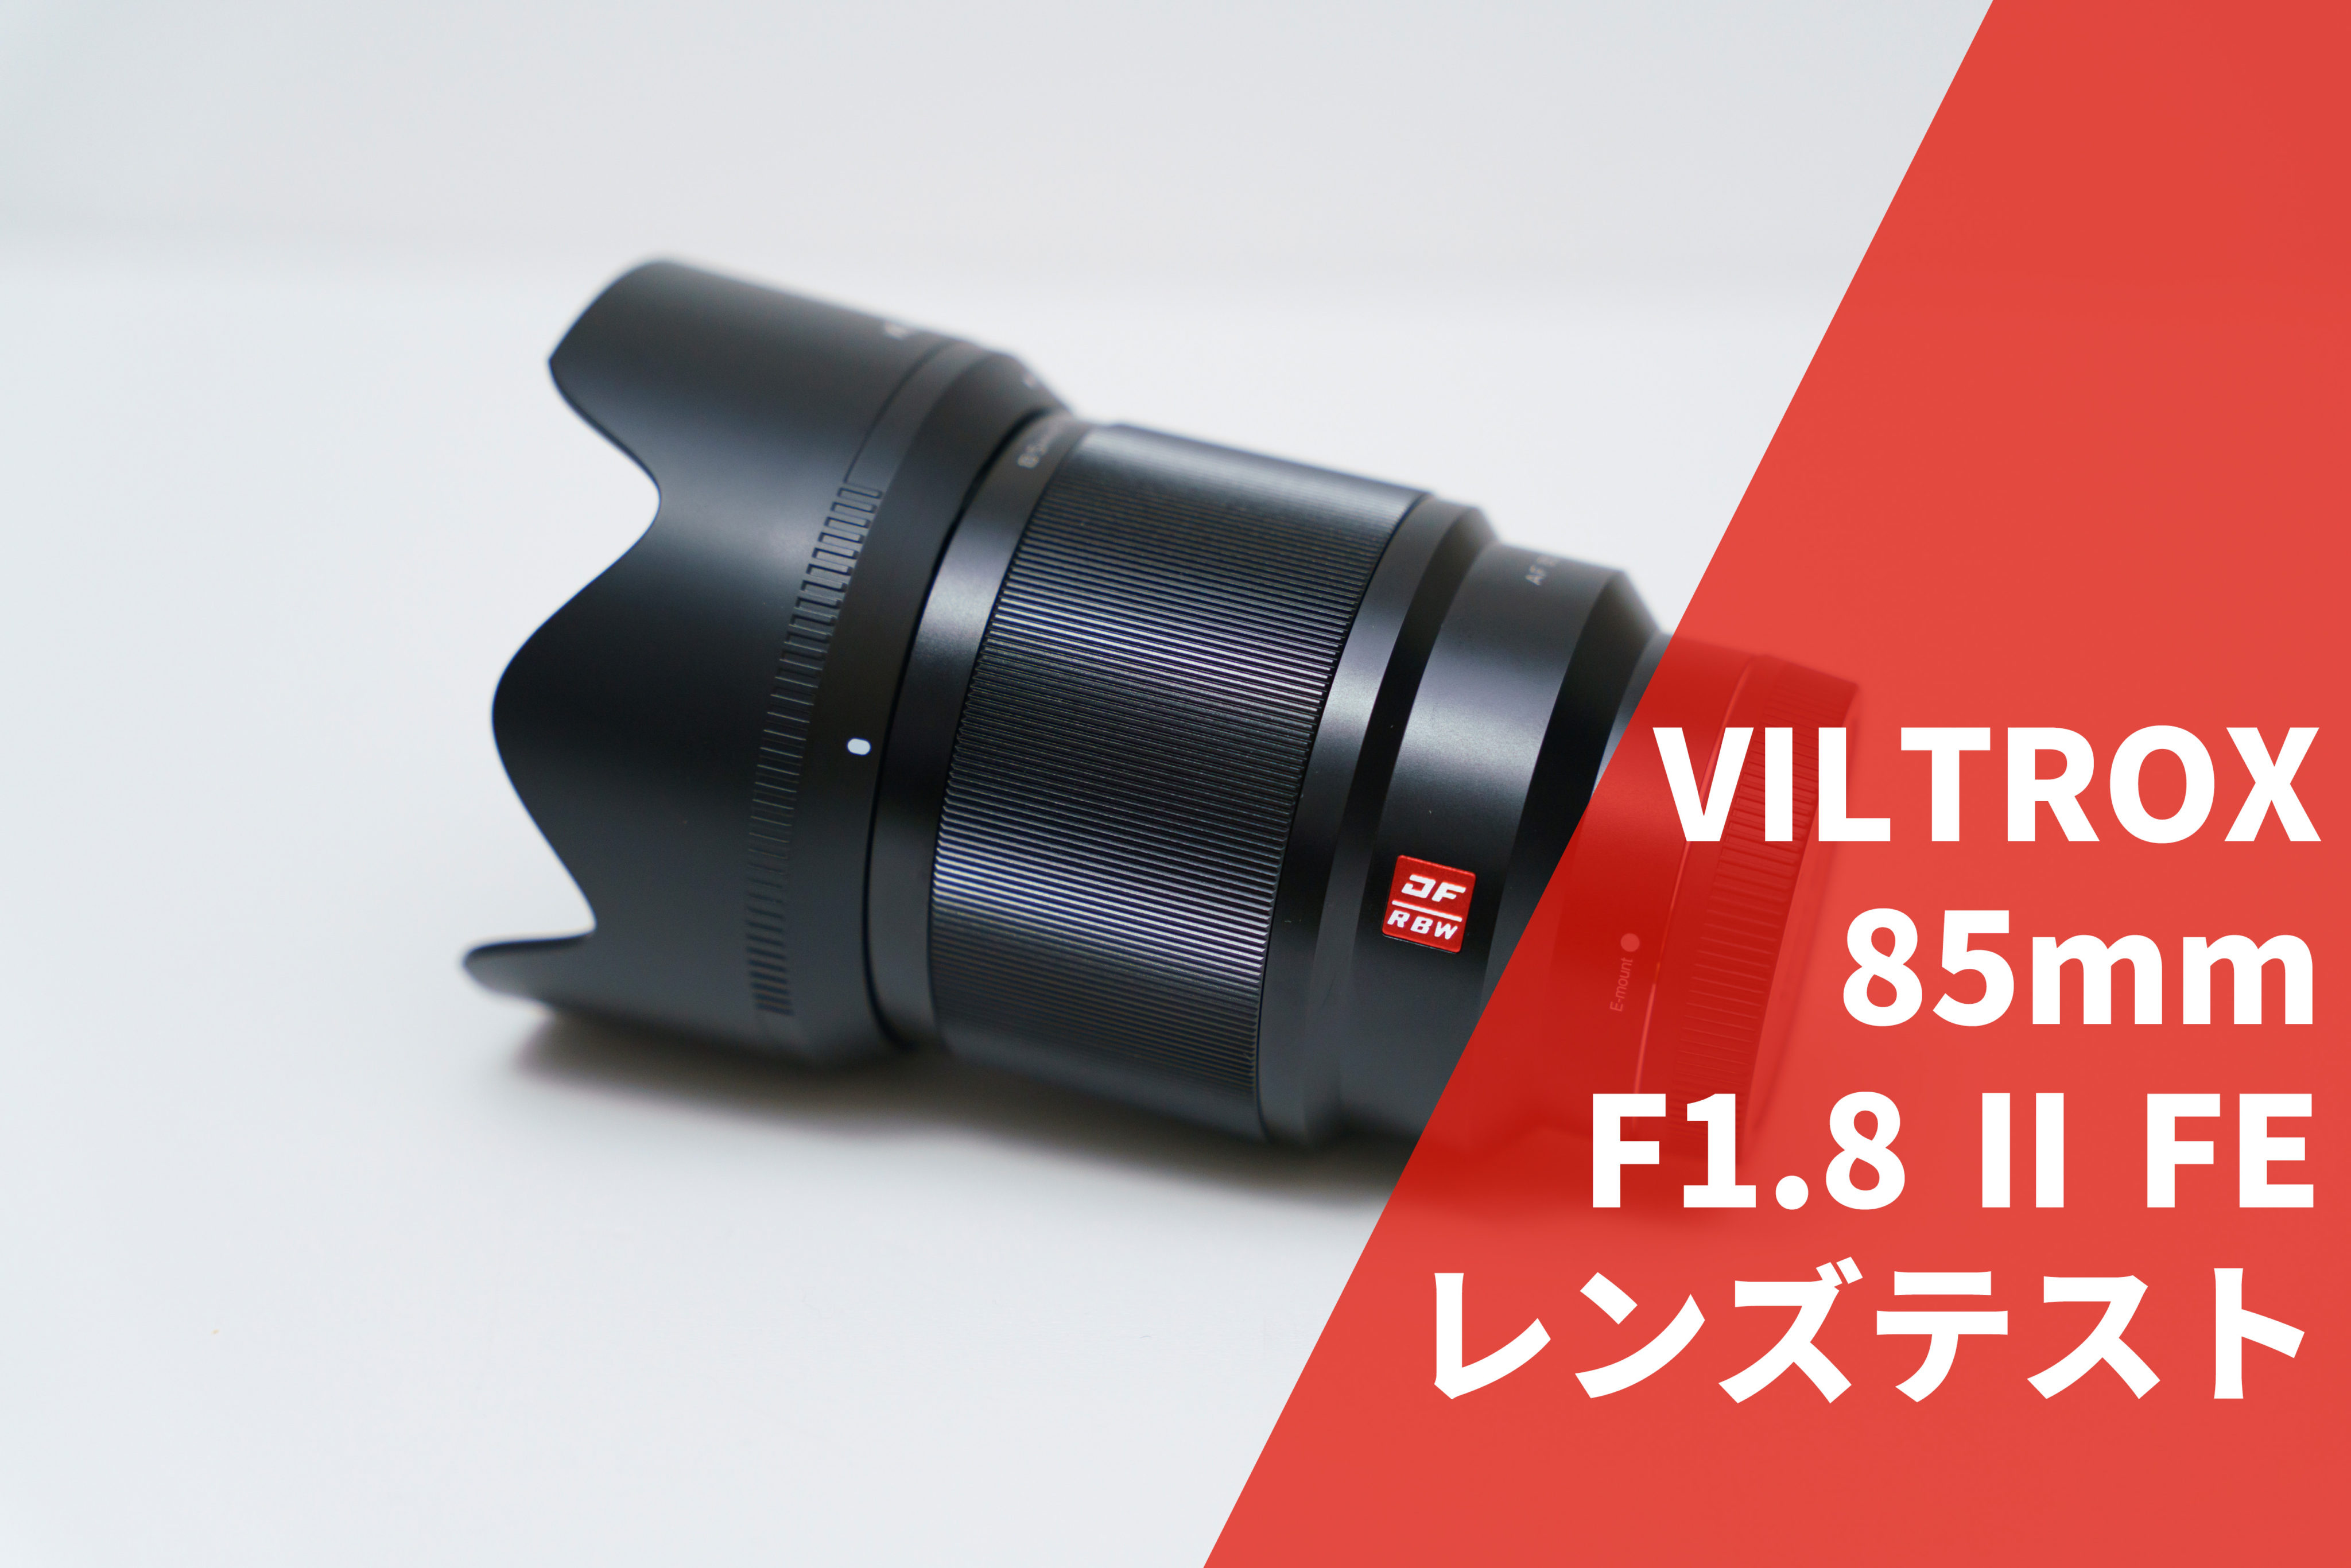 VILTROX AF 85mm F1.8 II レンズ収差テスト